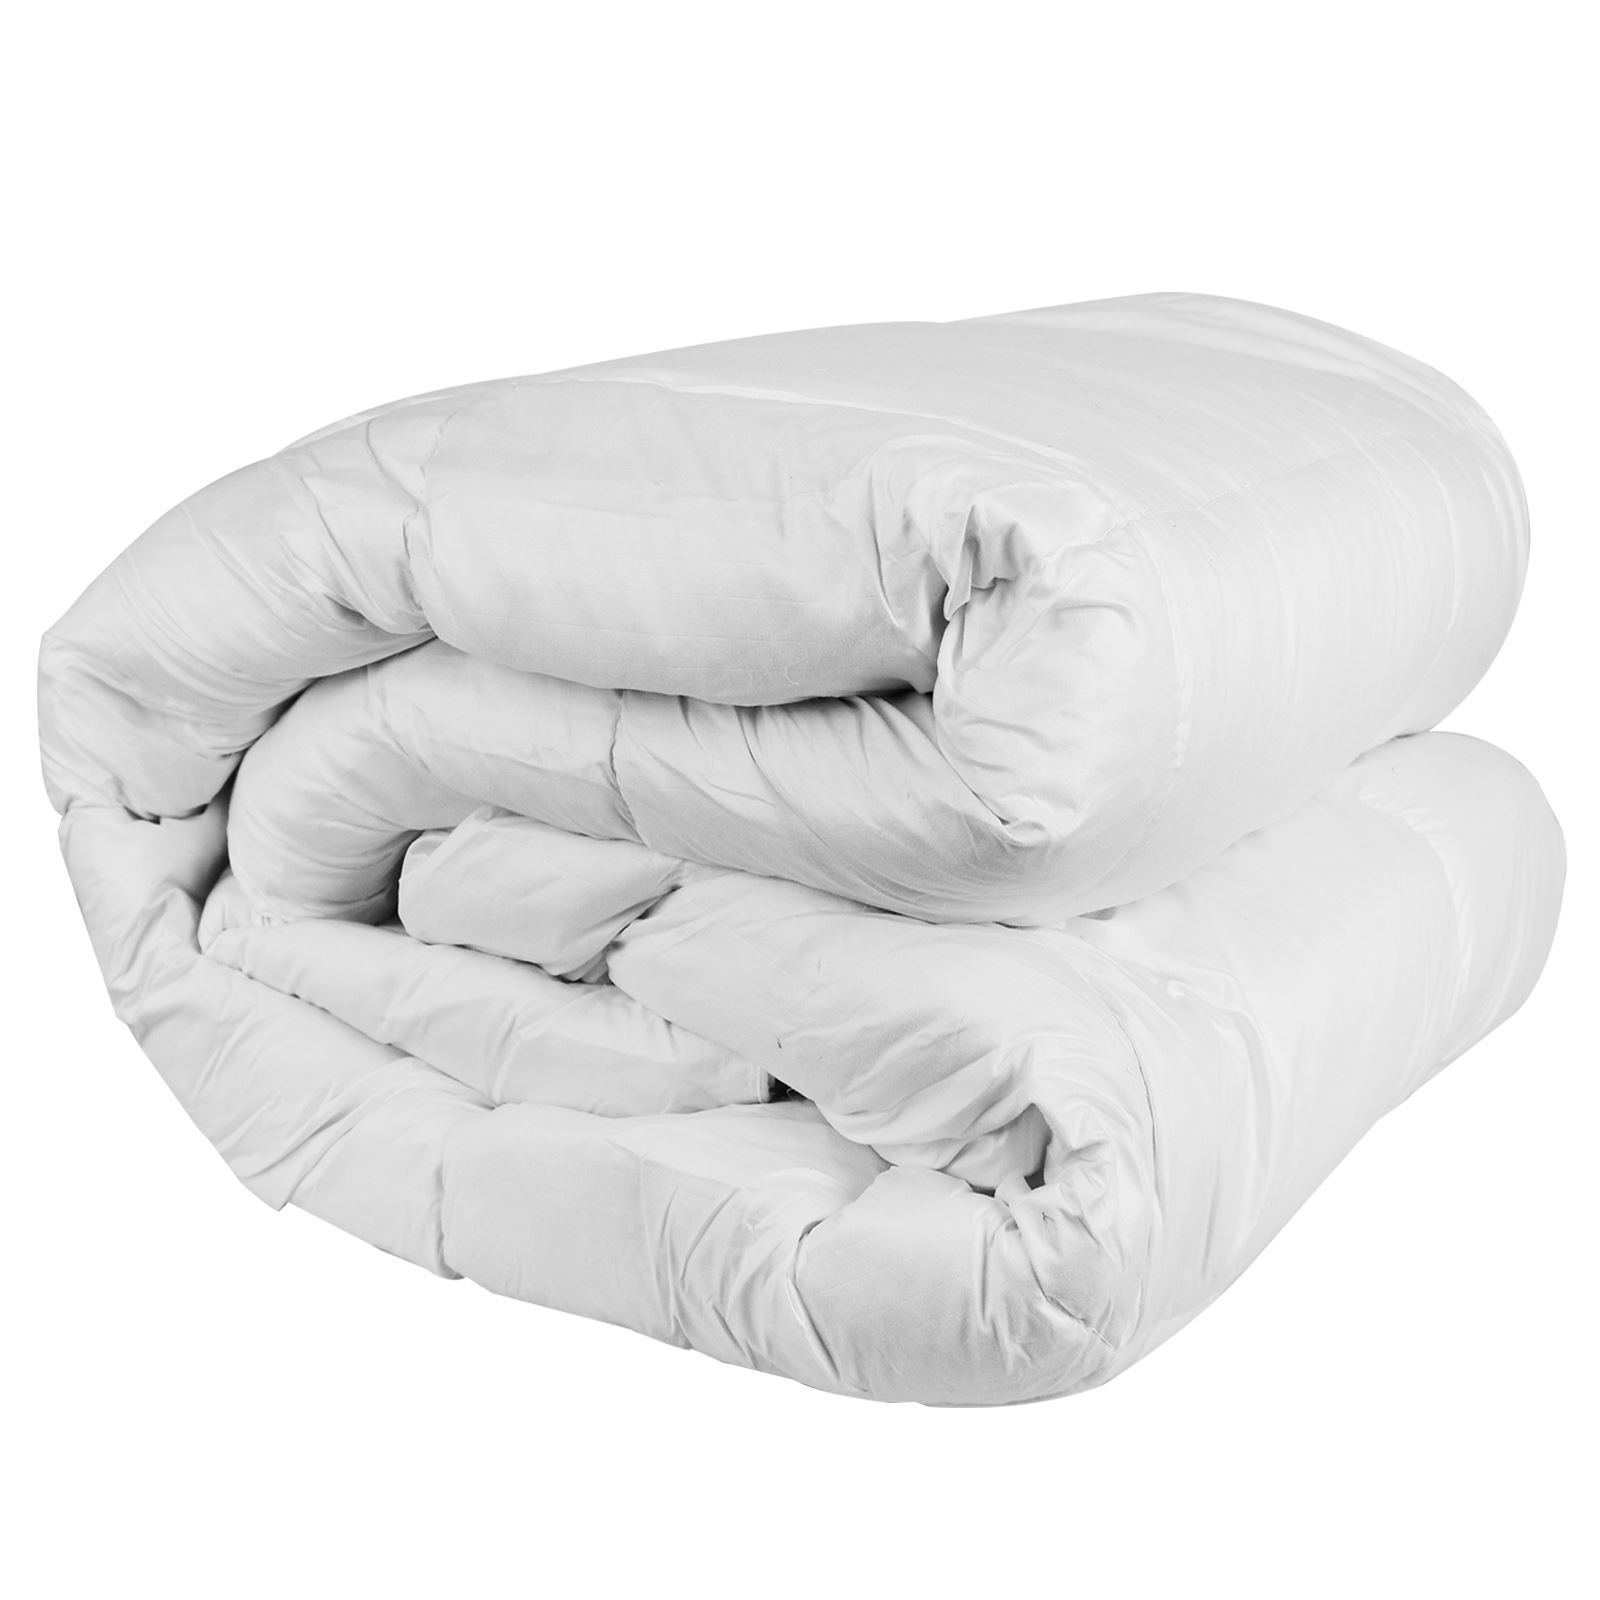 Lujo-Pluma-De-Pato-Abajo-Edredon-Ropa-De-Cama-Edredon-relleno-confortable-13-5-15-Tog miniatura 23